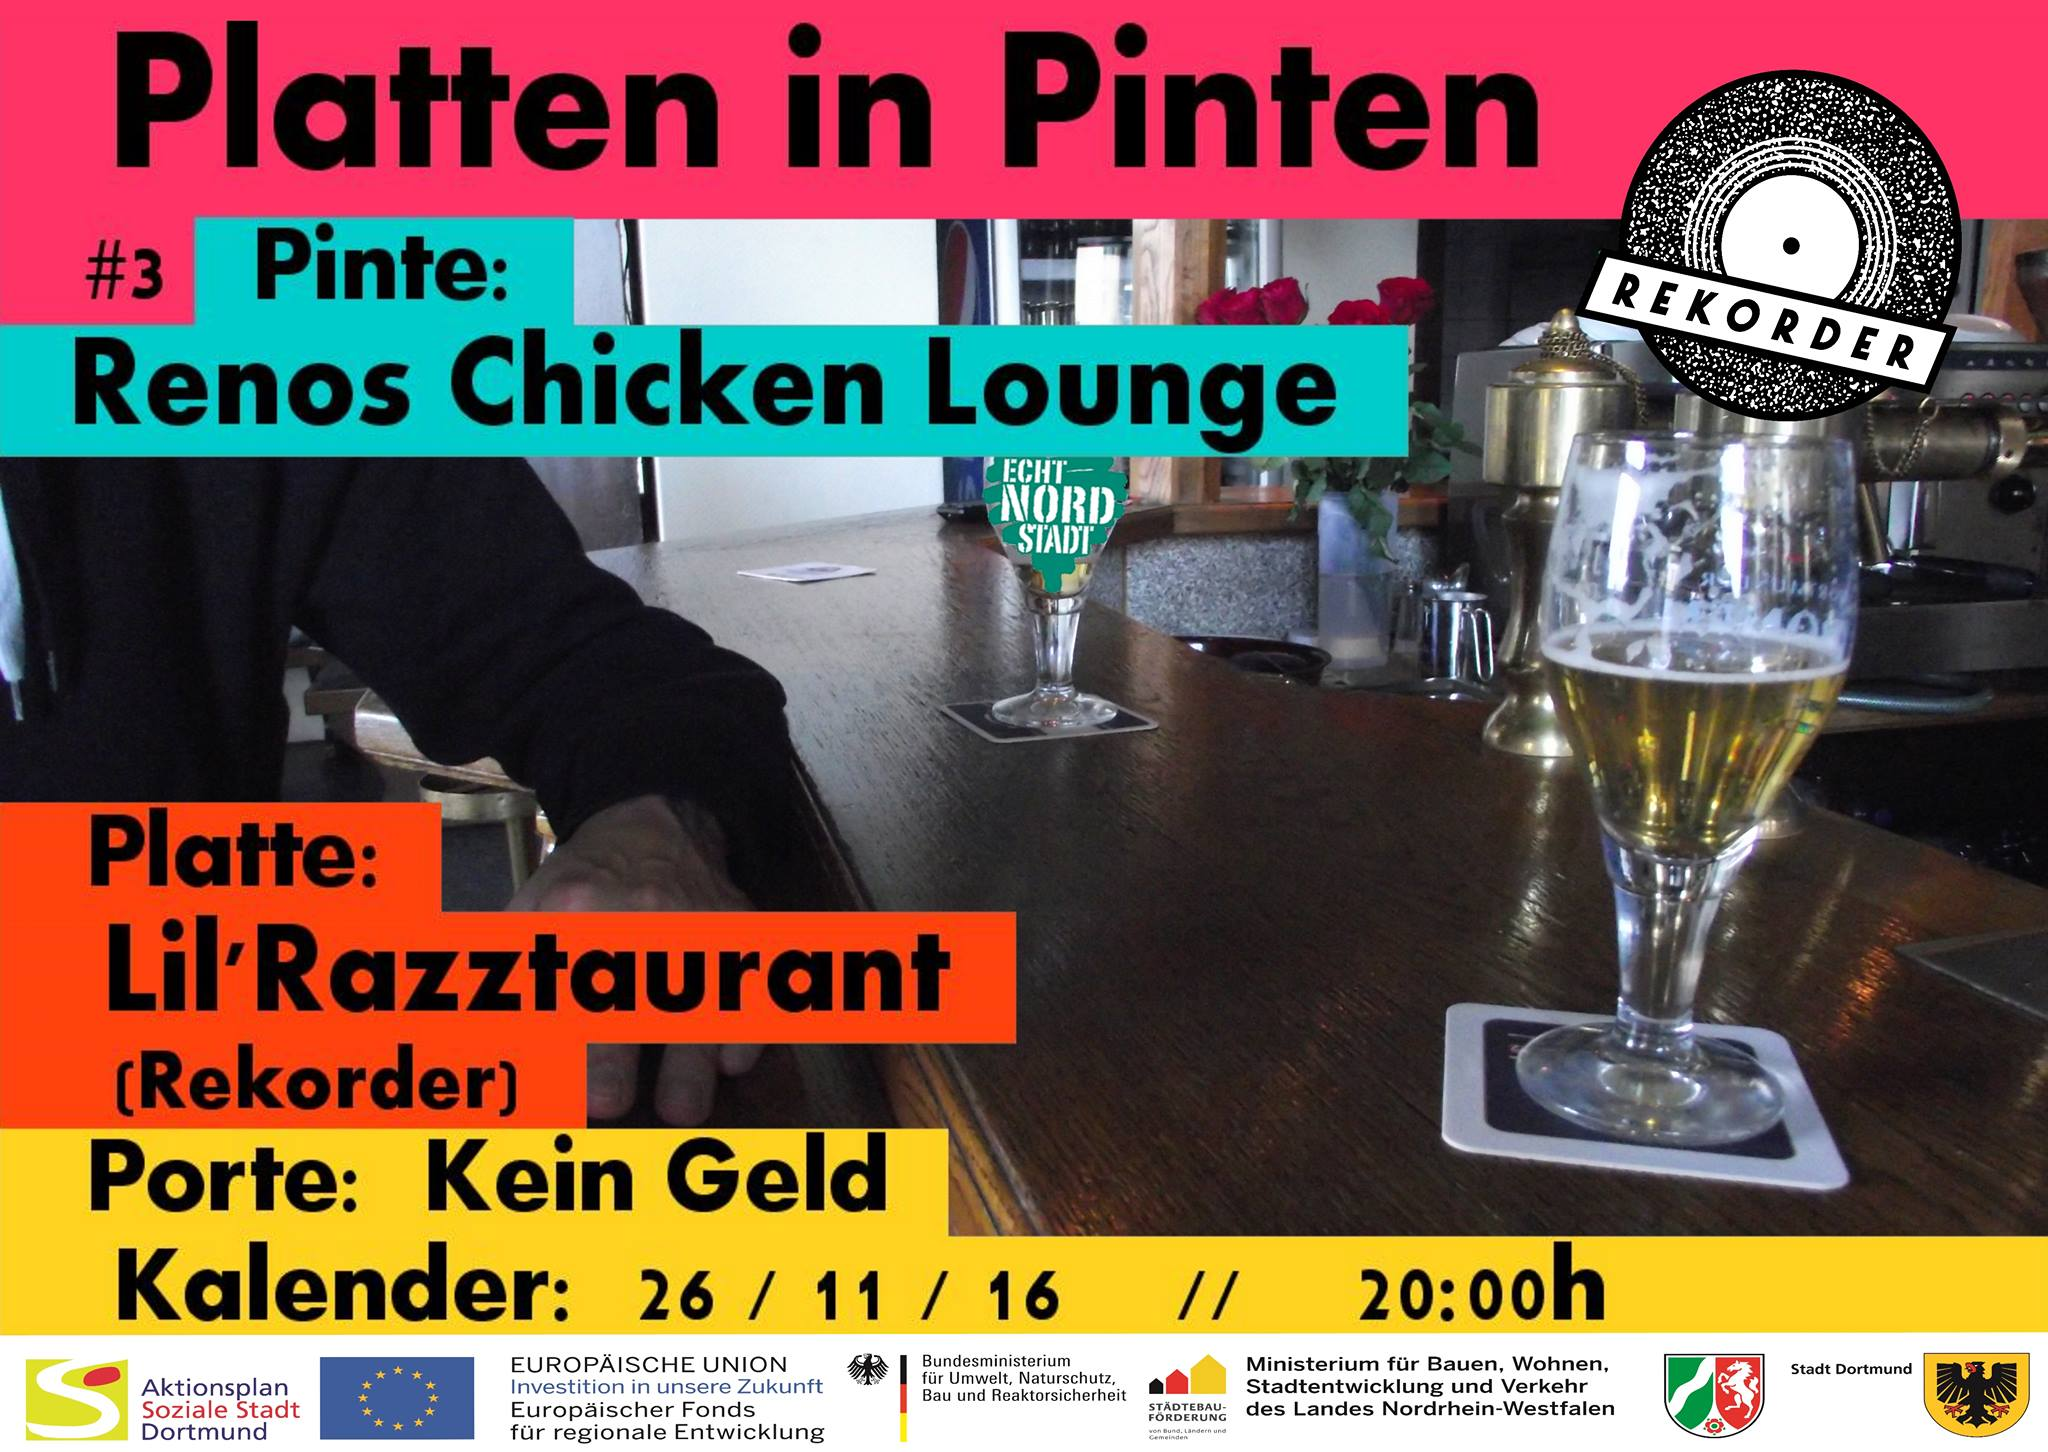 Platten in Pinten: Renos Lounge (Jannis Schloss) // mit Razzle